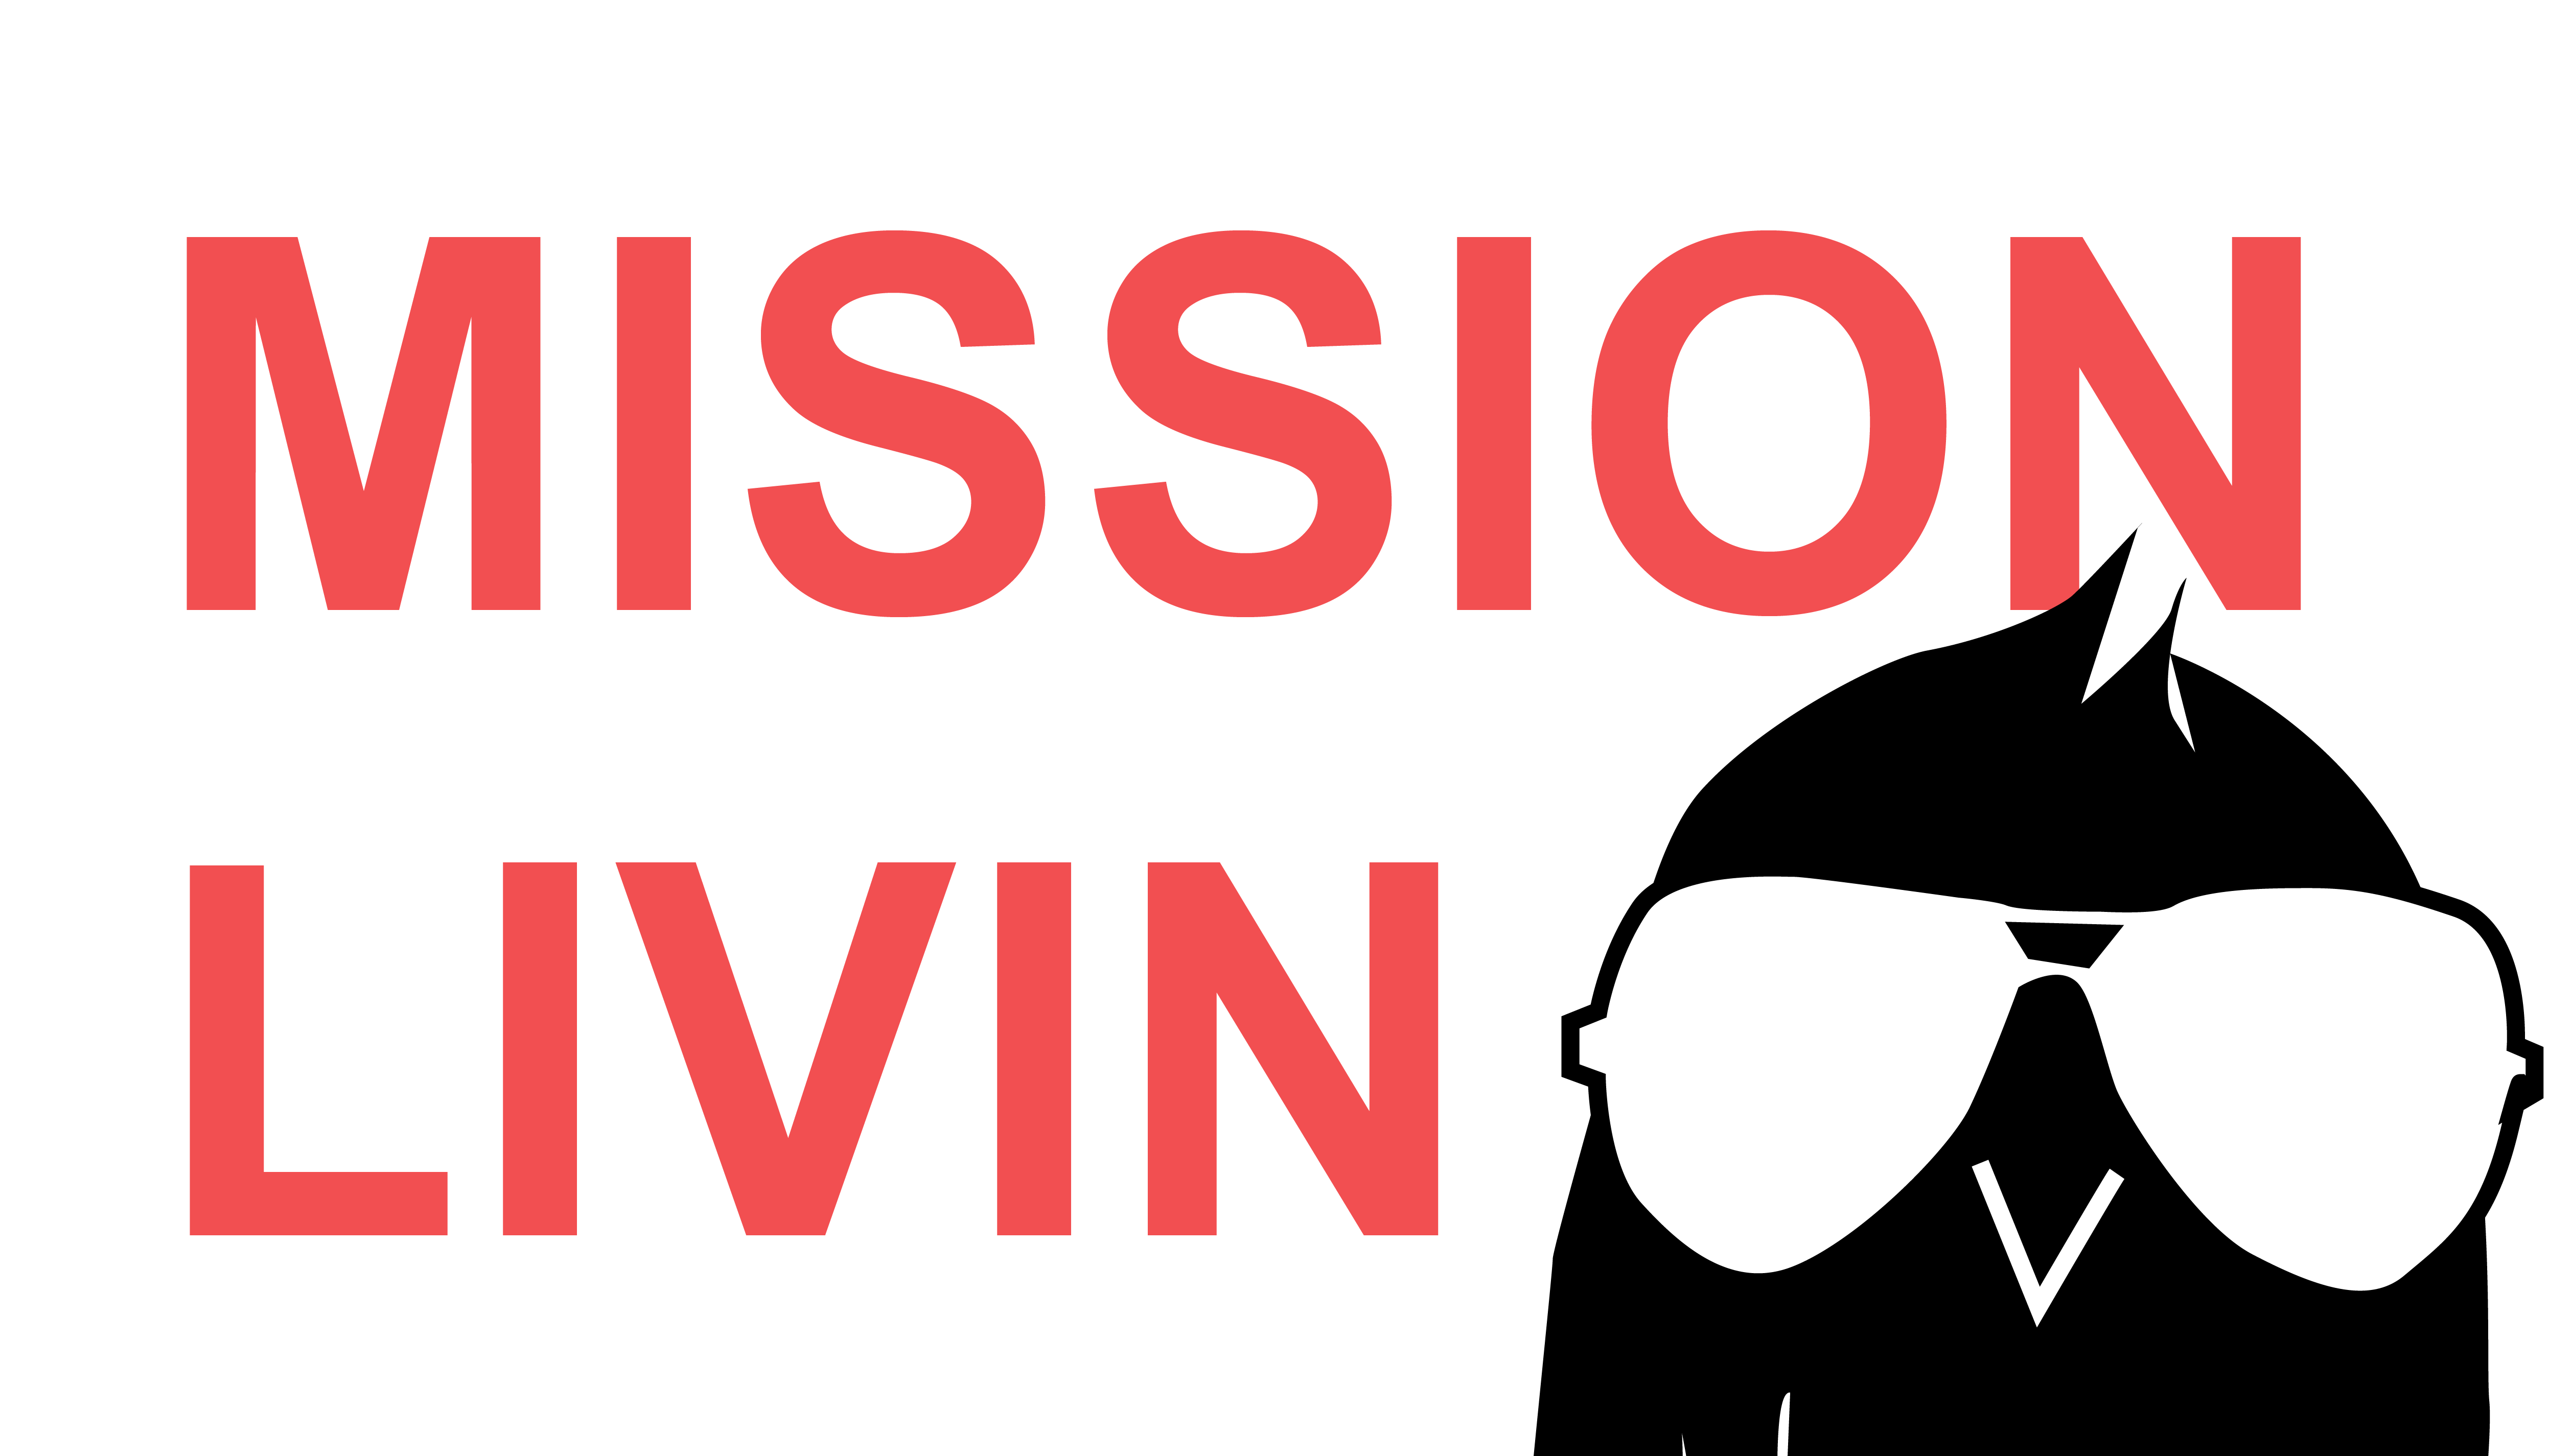 Mission Livin: Mission Statement Tool